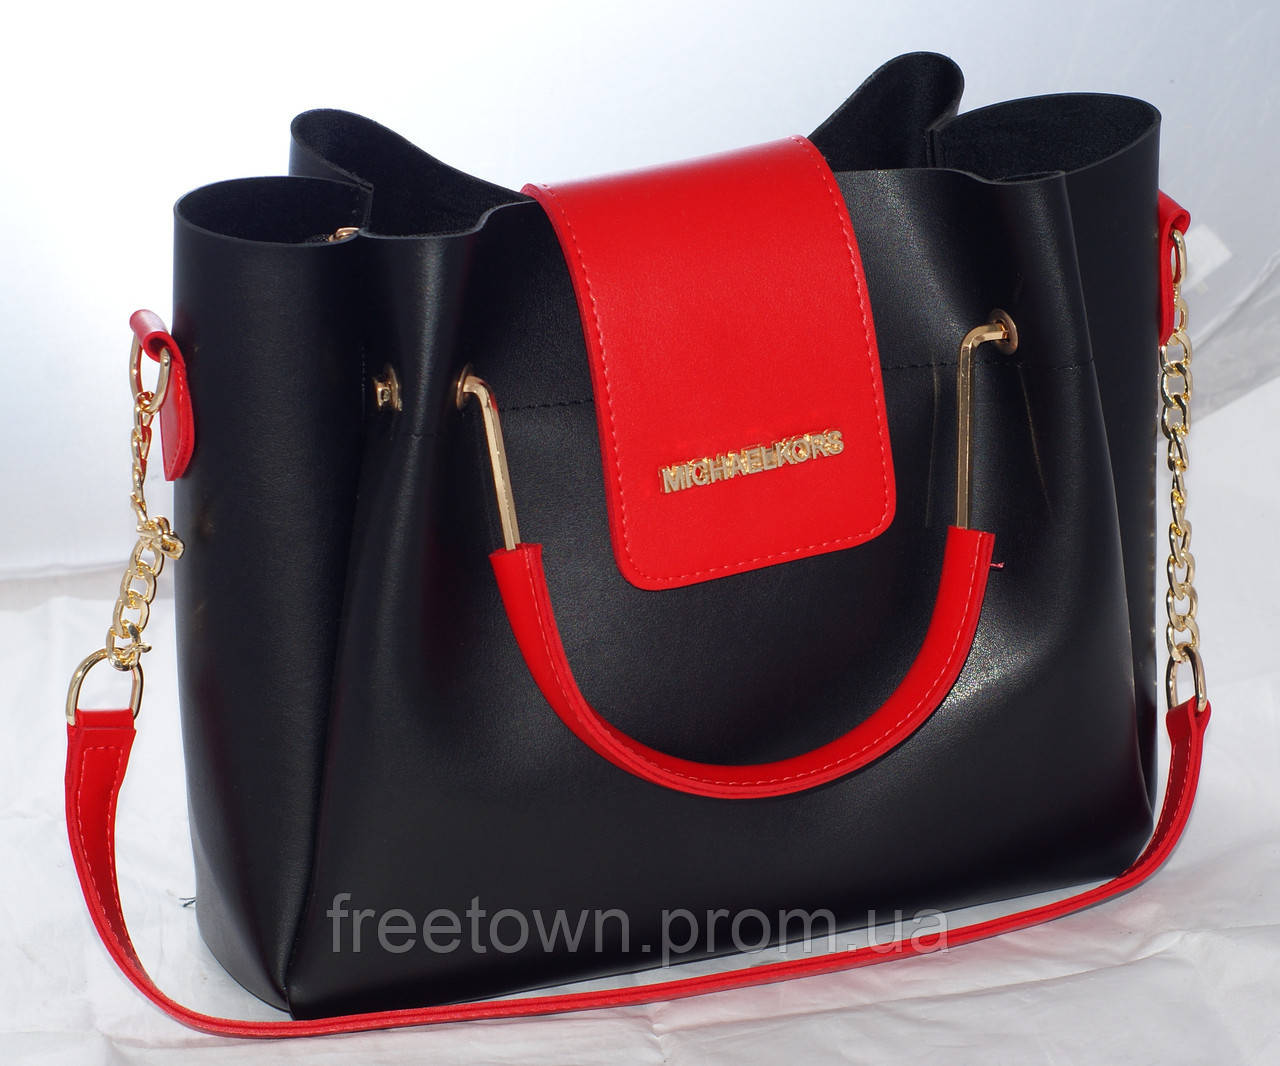 Женская сумка Michael Kors (Майкл Корс), черная с красным   продажа ... 39e63b597b8